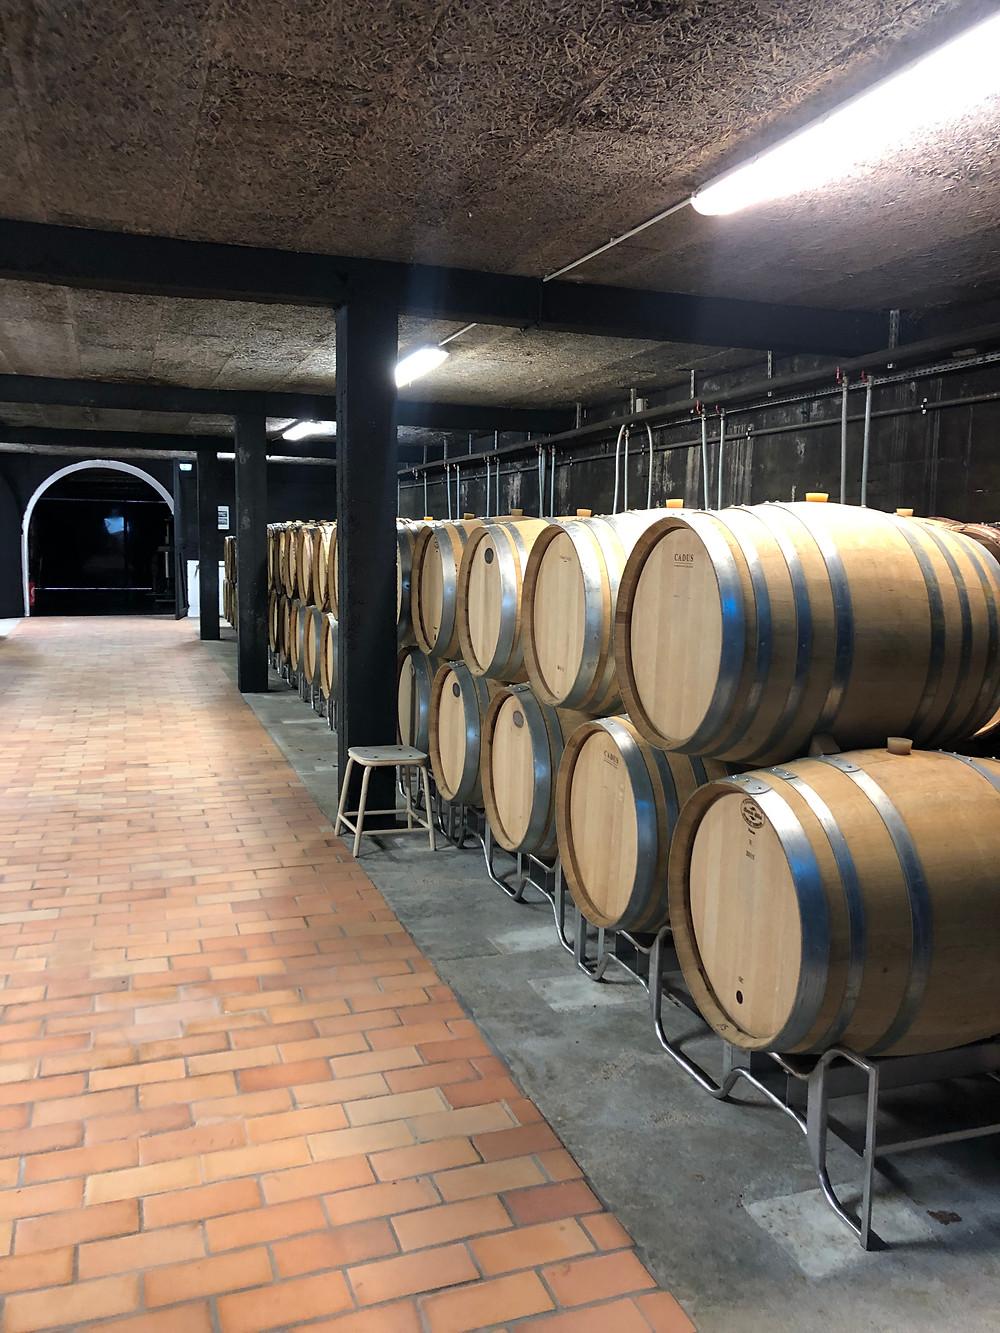 Oak barrels with Chablis wine in Domaine des Malandes wine cellar organic Chablis producer visit